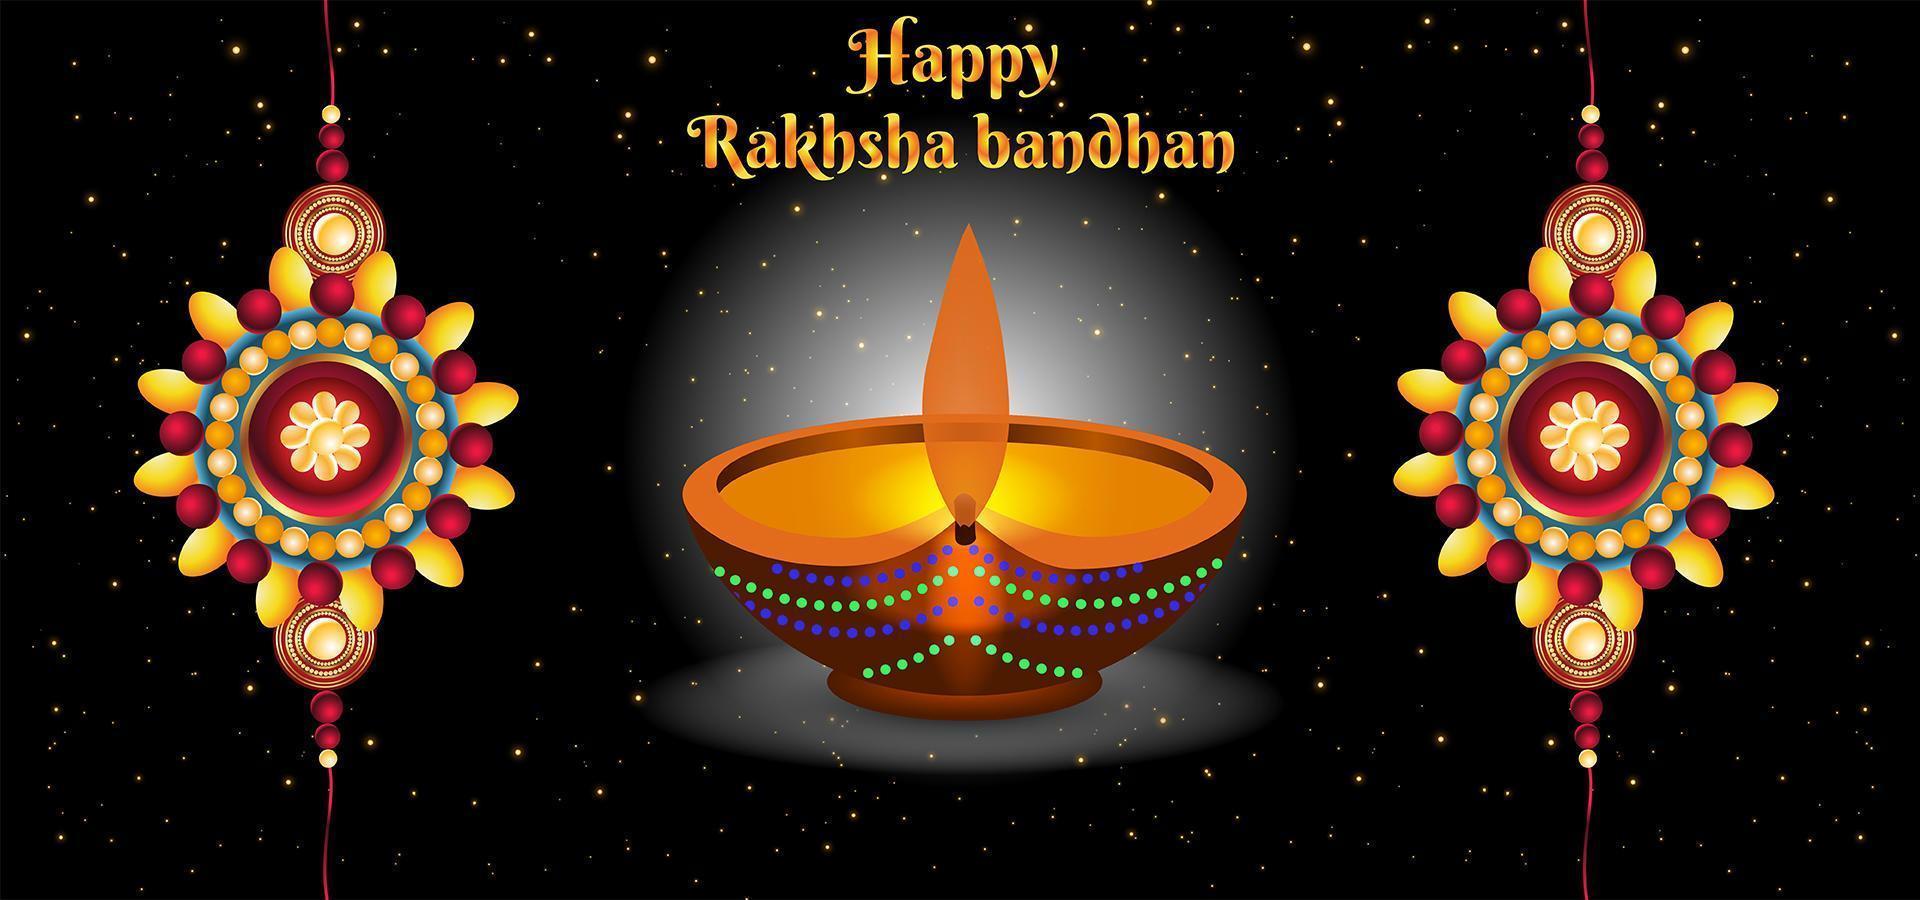 felice raksha bandhan celebrazioni sfondo astratto vettore